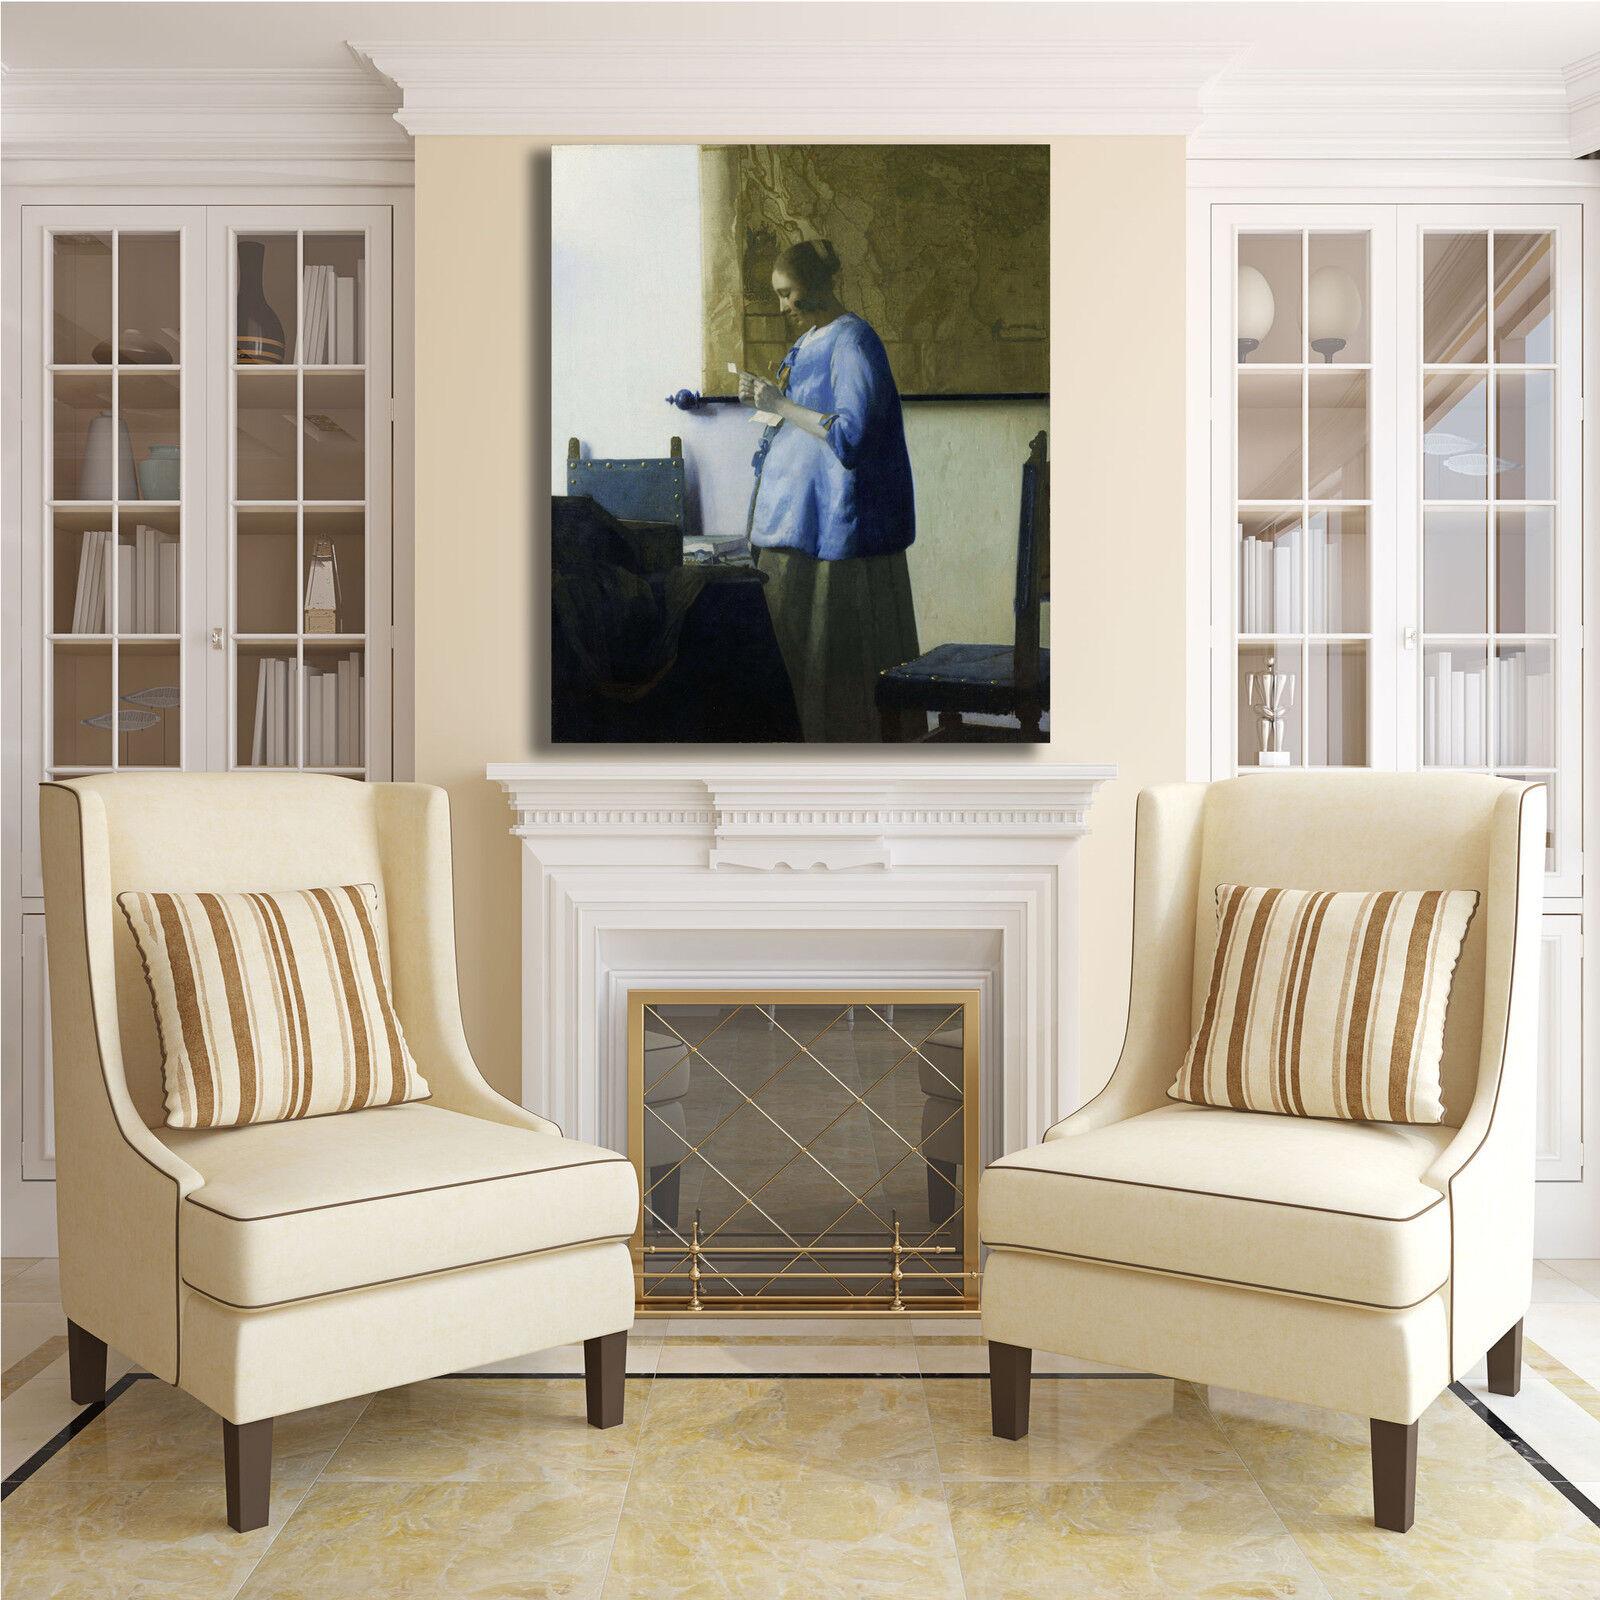 Vermeer  a legge una o lettera quadro stampa tela dipinto telaio arRouge o una casa 603615